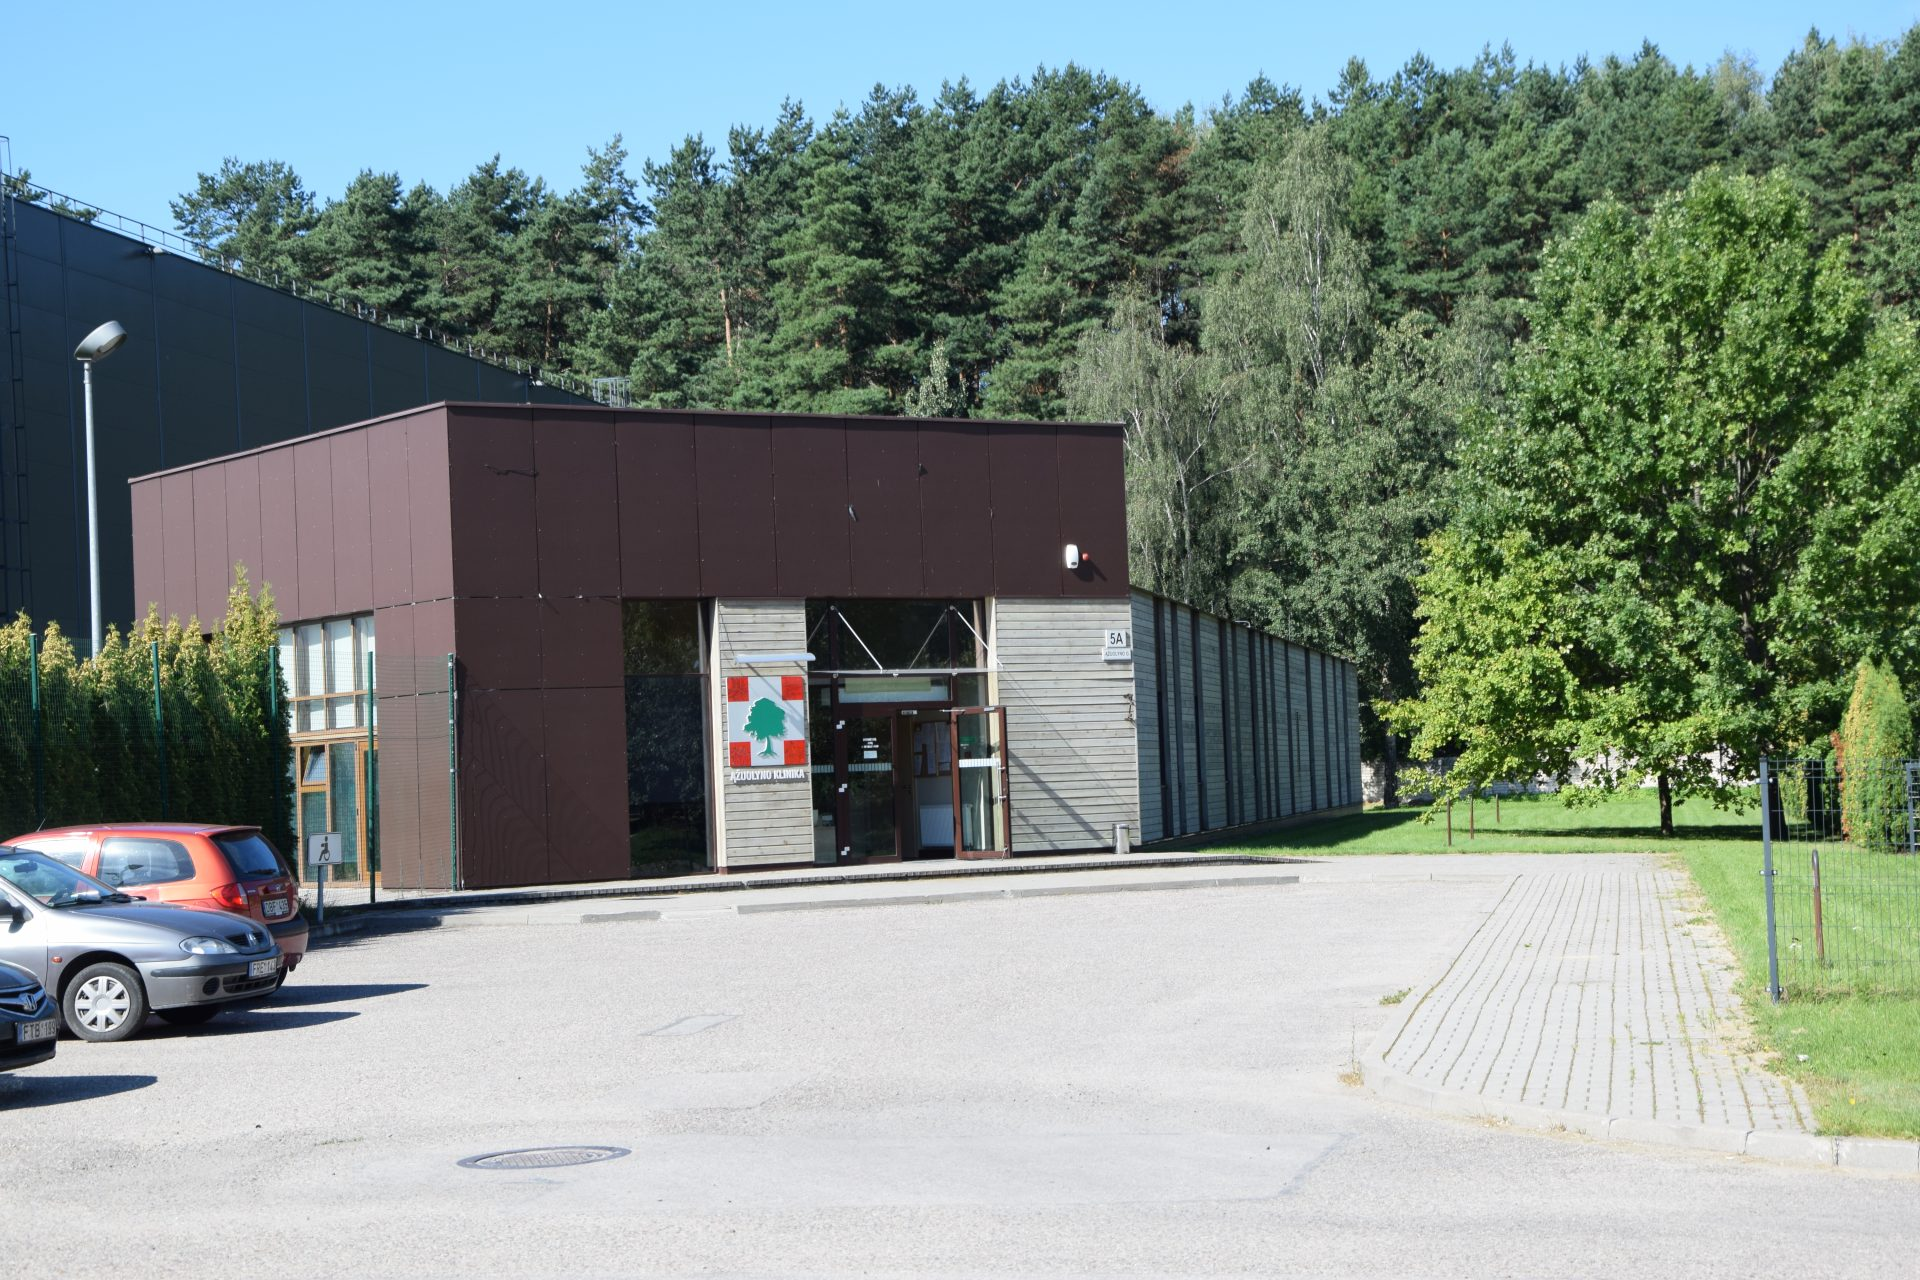 Psichiatrinės reabilitacijos klinikos Ąžuolyno g. 5, Vilnius, rekonstravimo darbai